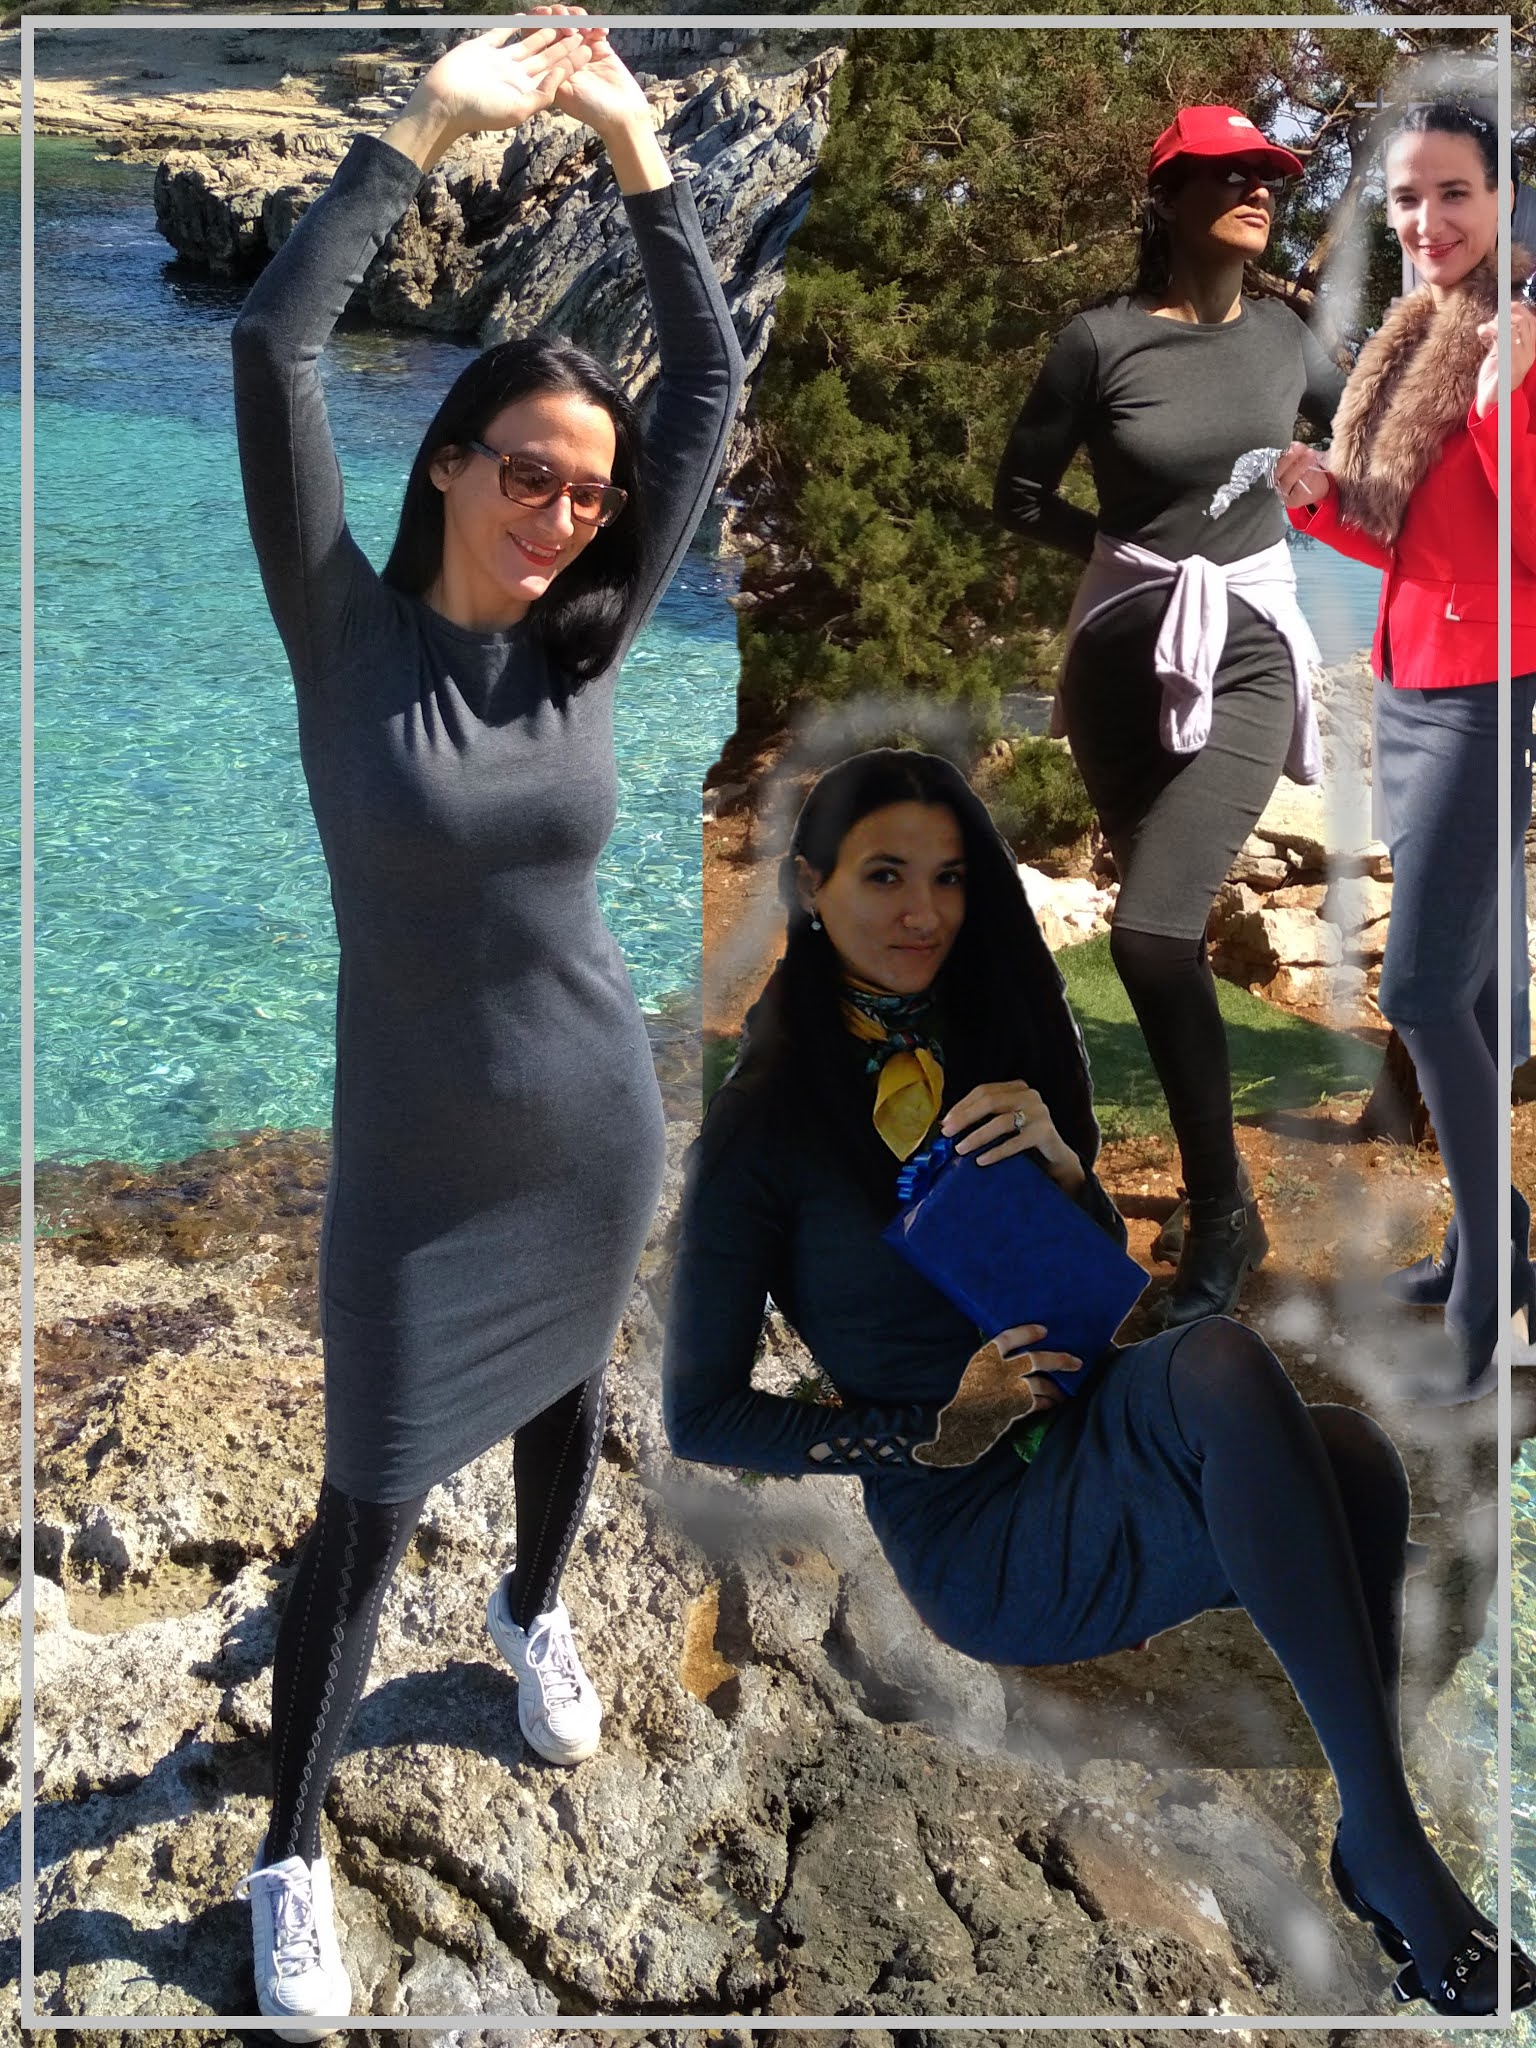 #modaodaradosti fashion and lifestyle blog A NEUTRAL GREY DRESS FOR A VISIT TO STARI GRAD